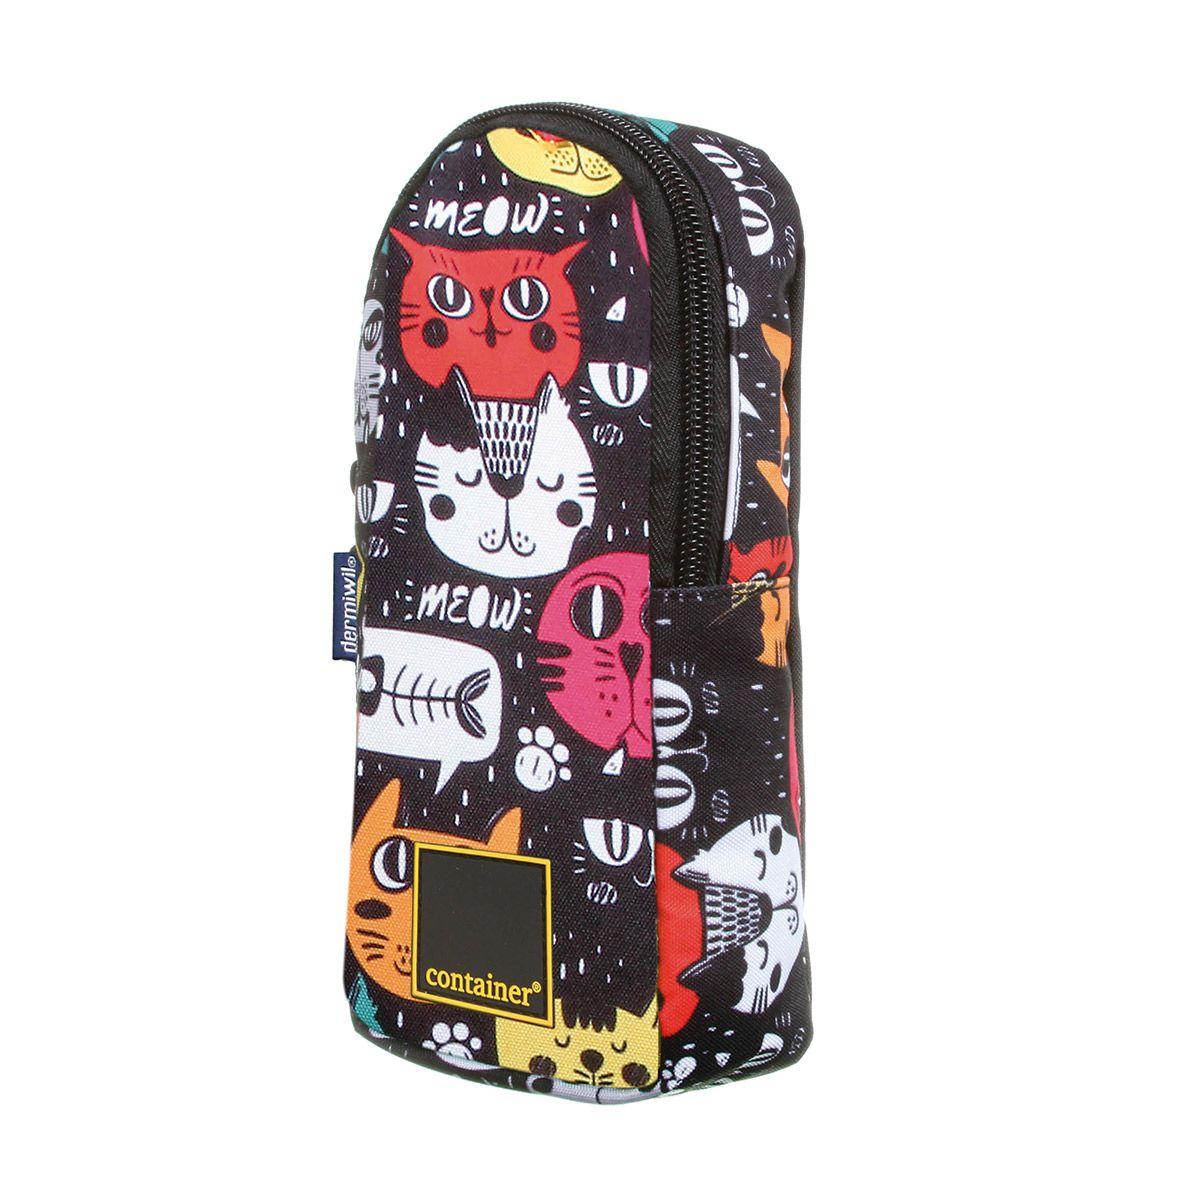 Kit Mochila Escolar Gato Meow - Oficial Container + Estojo